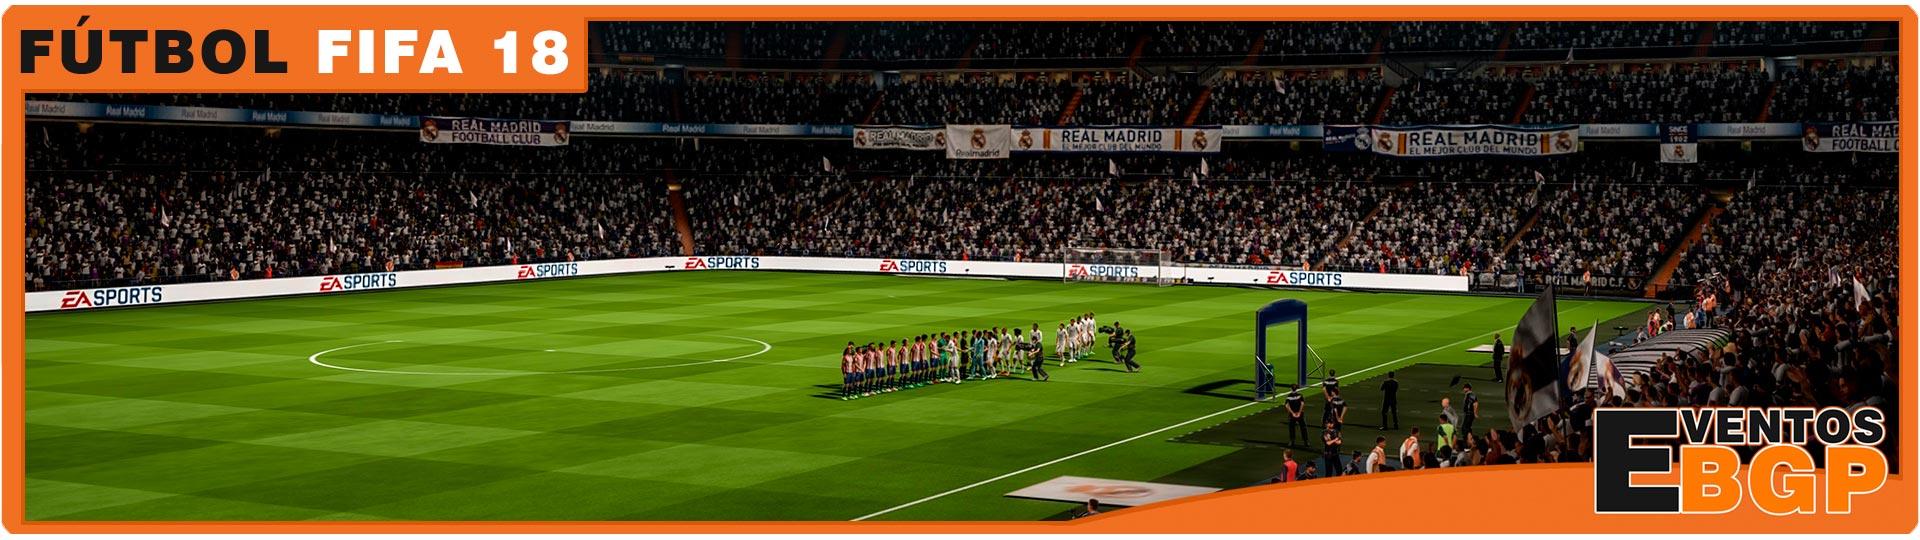 Banner Videojuegos Fútbol Playstation 4 PS4 Torneo FIFA 18